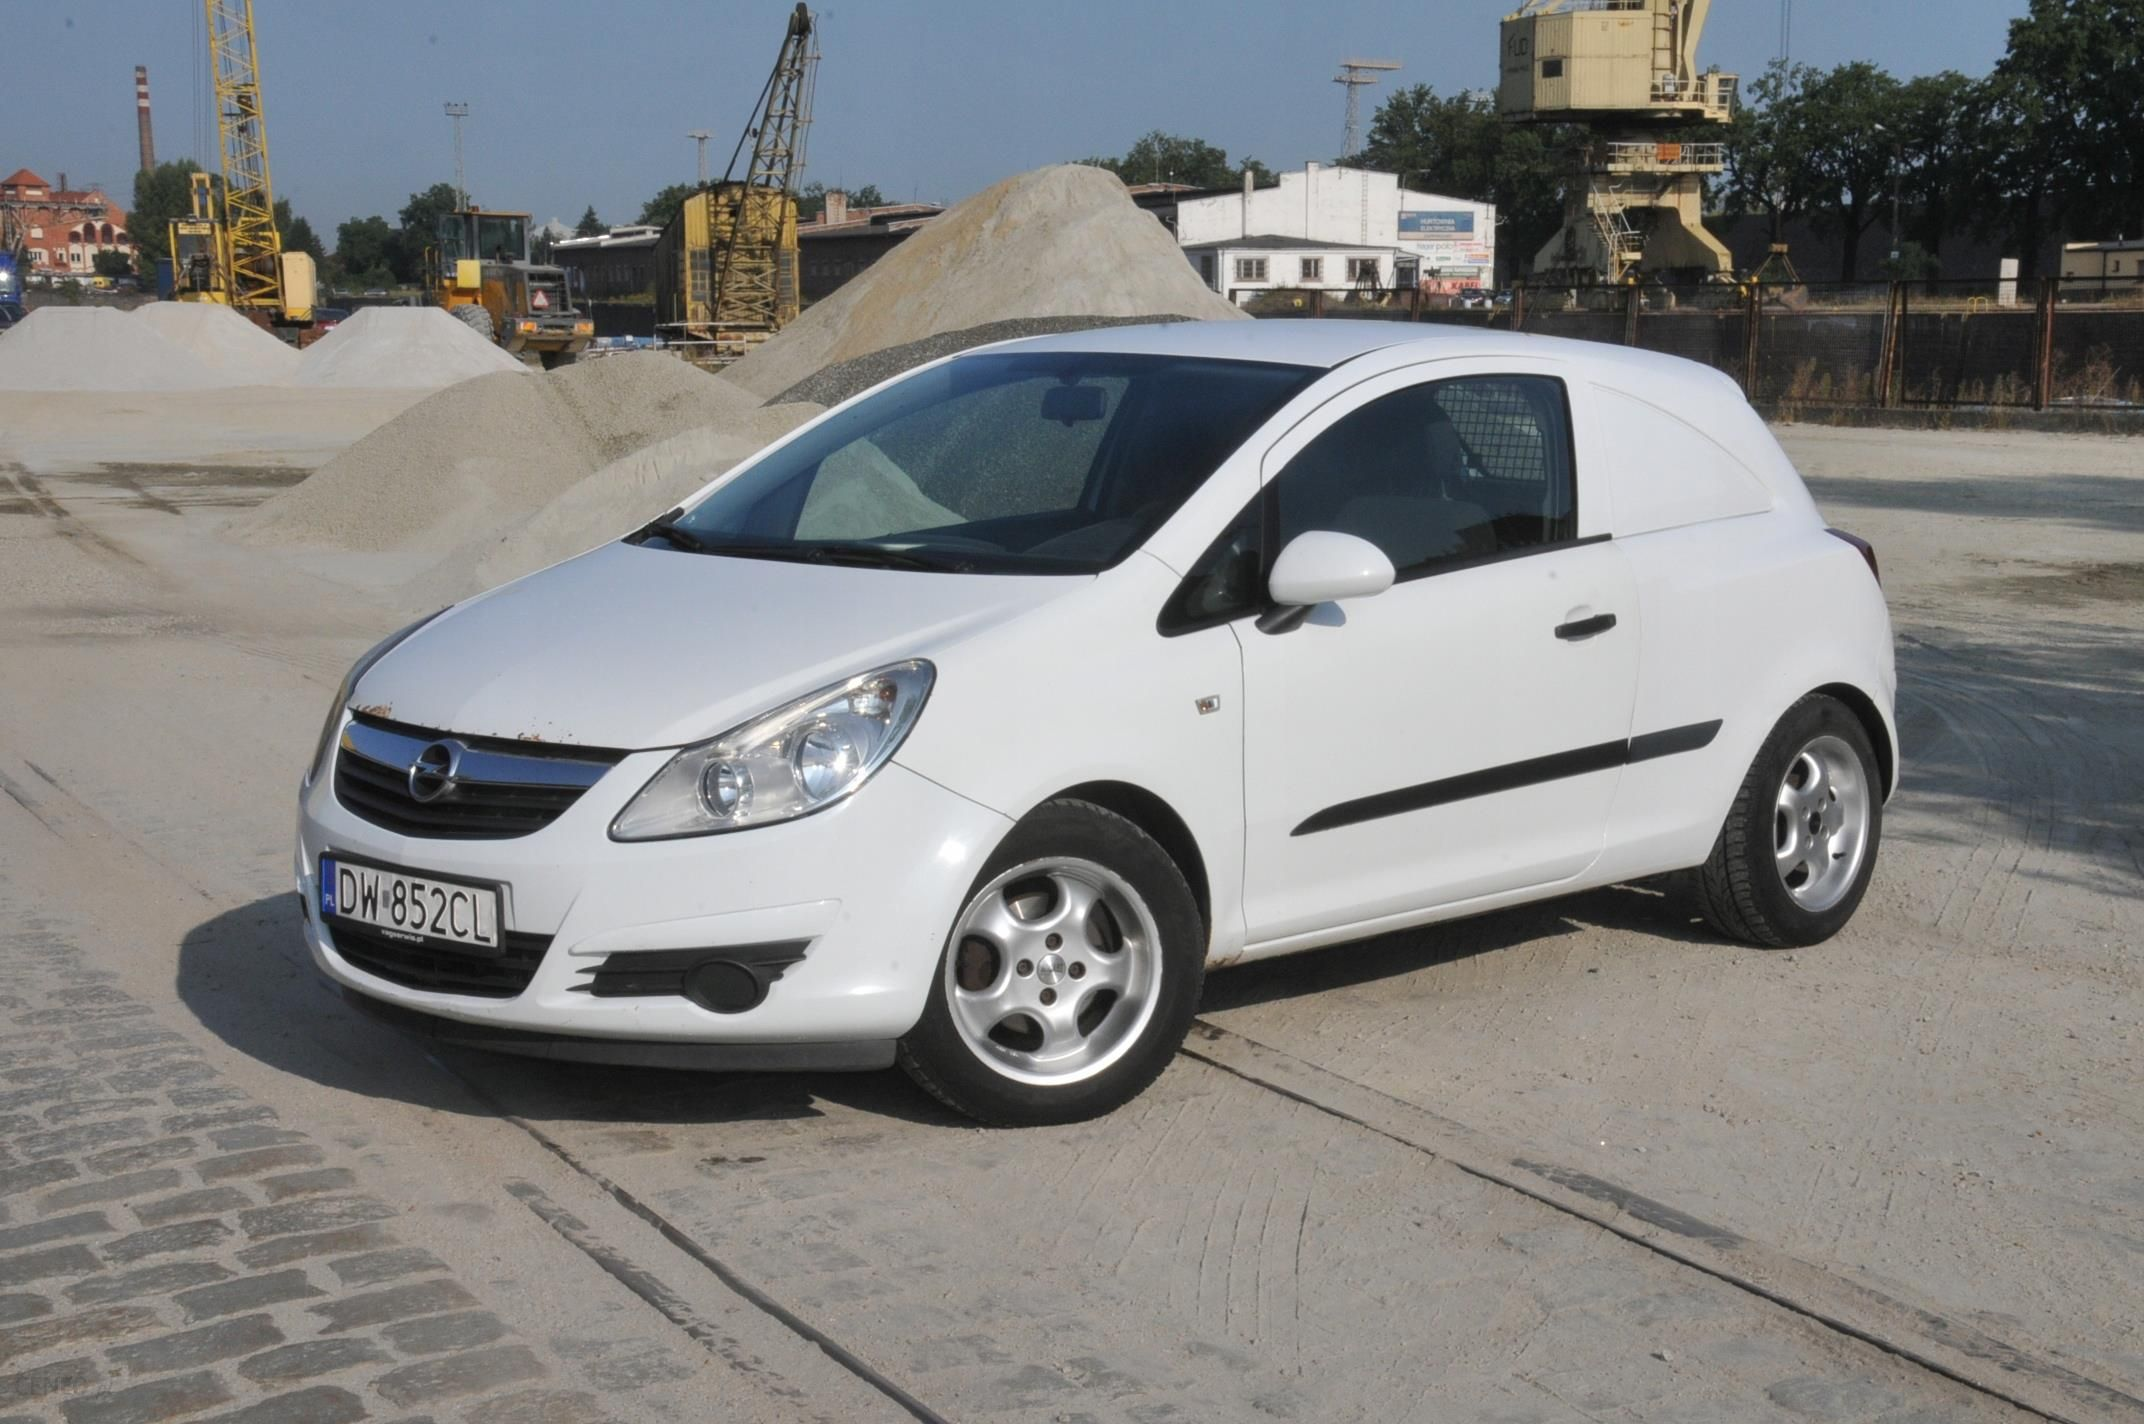 Opel Corsa D 12 16v Z16xep Alufelgi 15 3d Opinie I Ceny Na Ceneopl